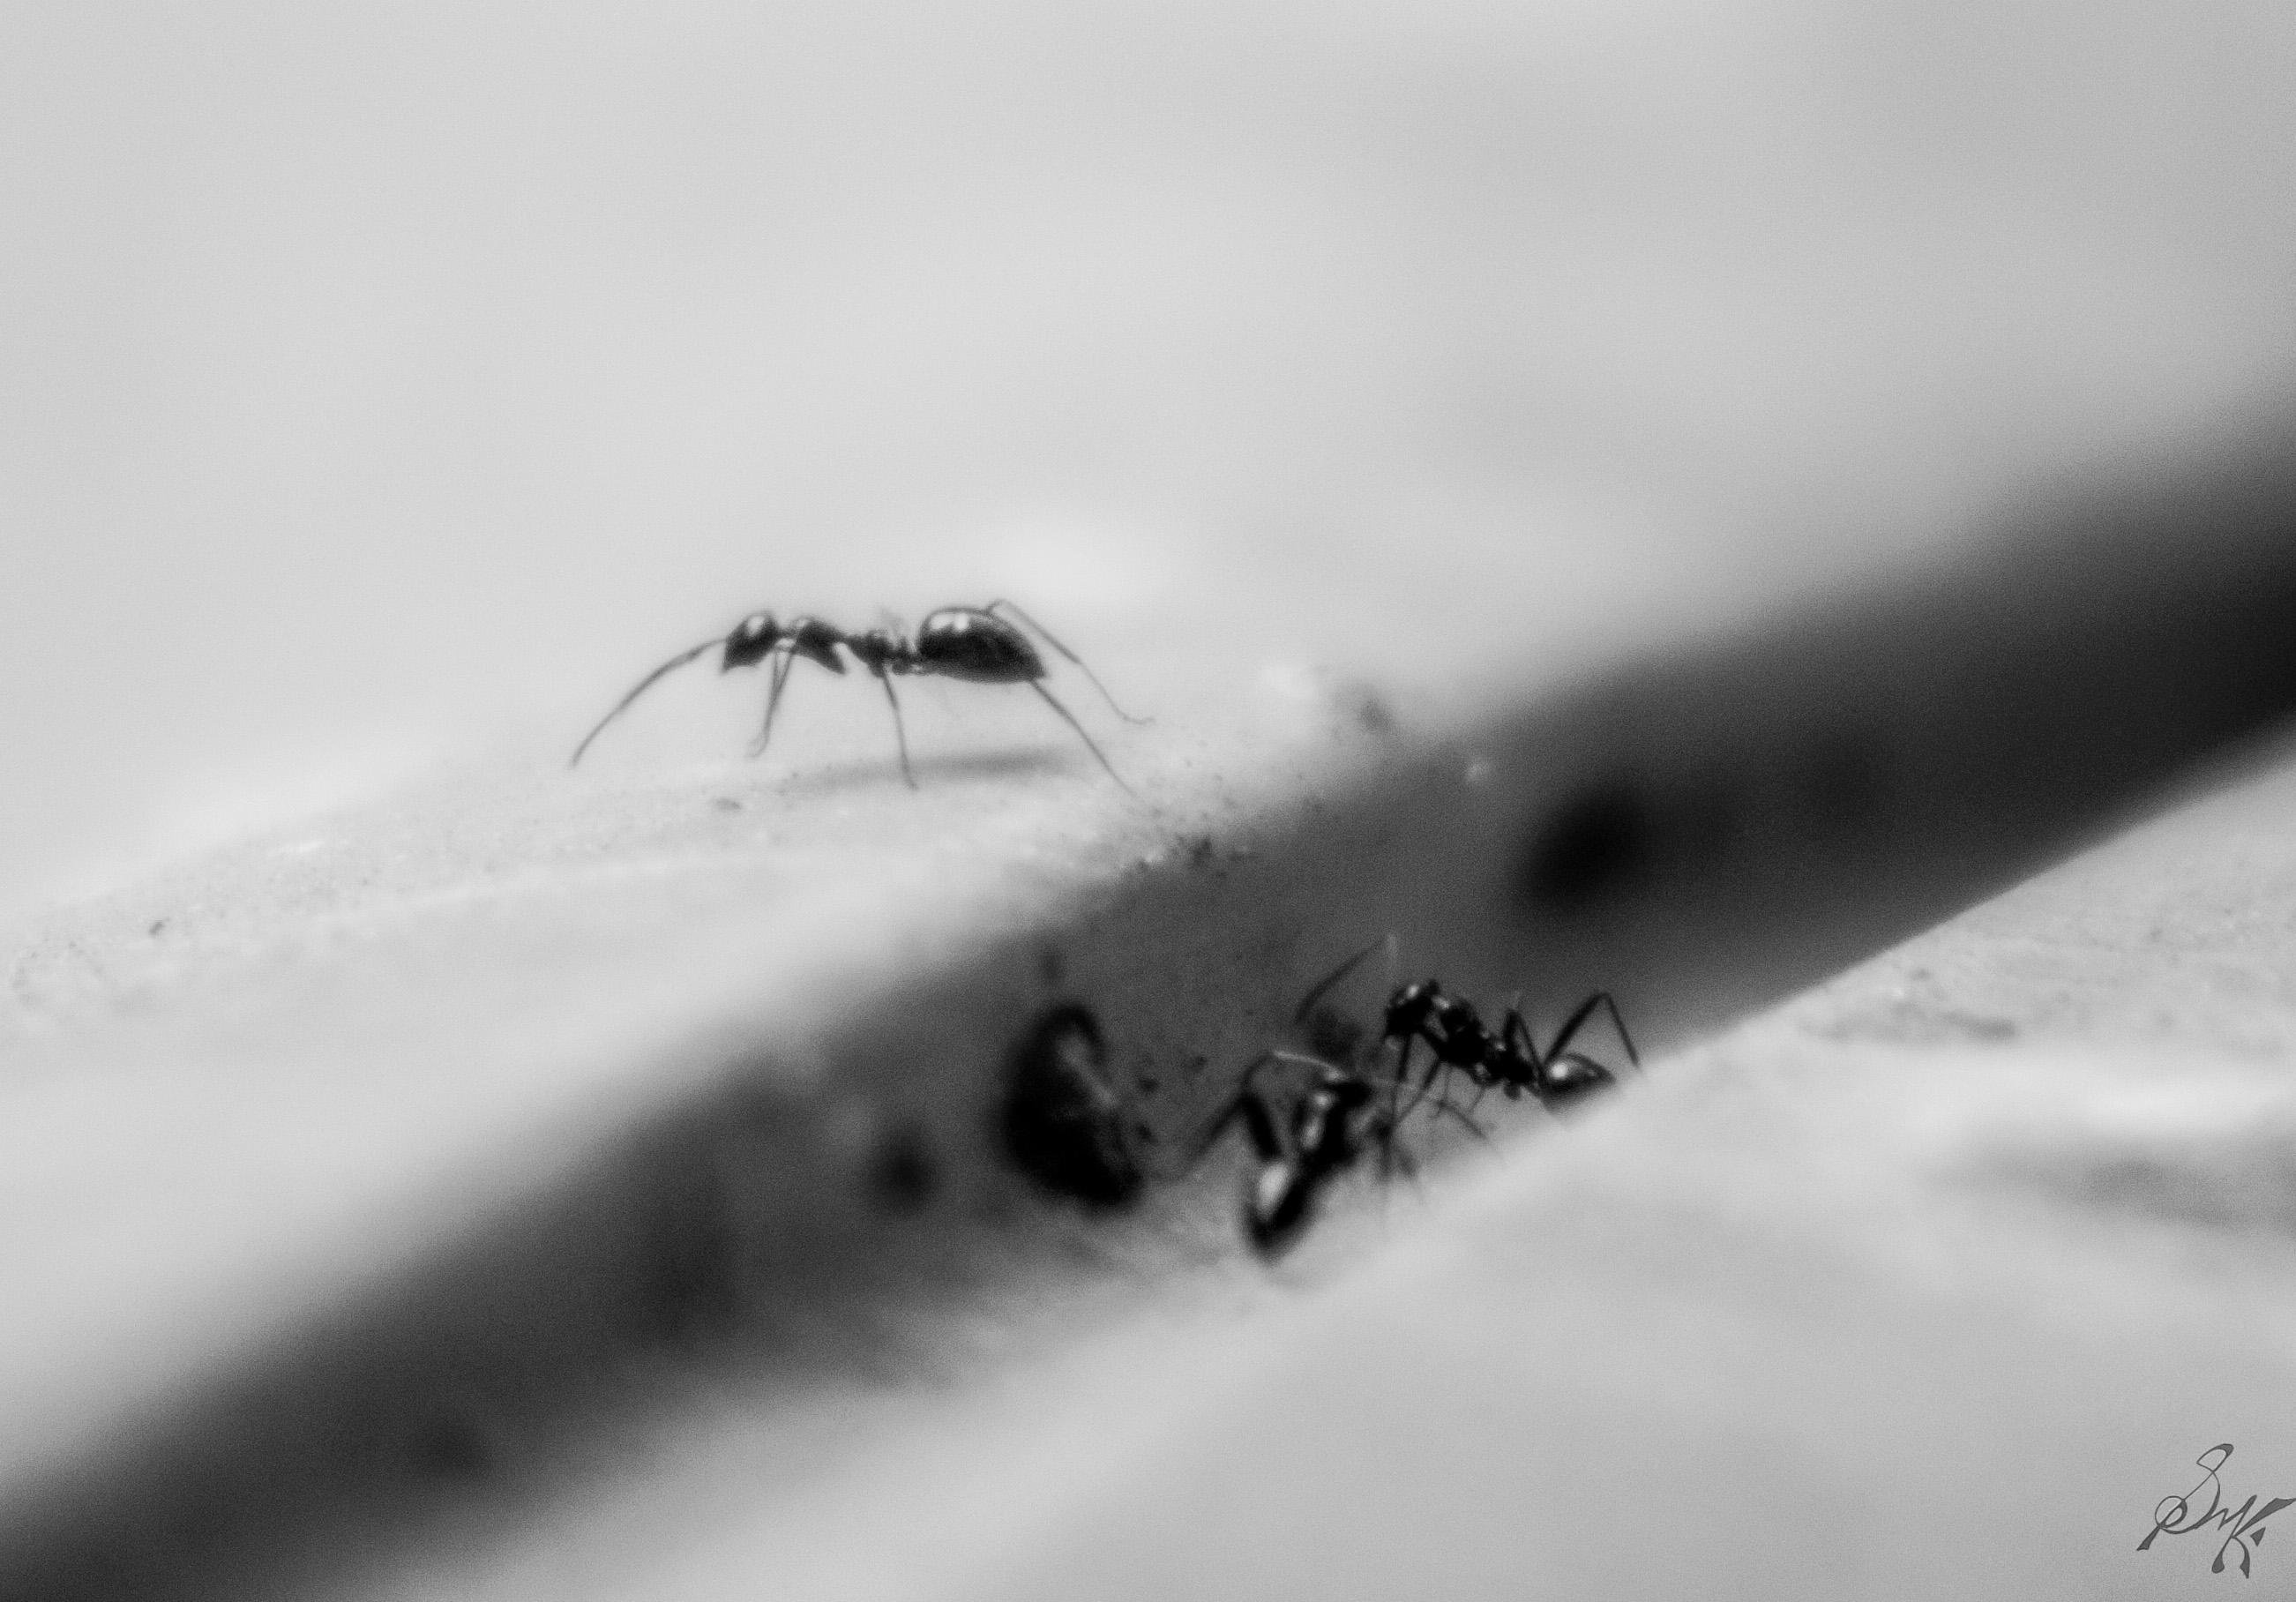 Tiny Black Ants Kitchen Similiar Black And White Tiny Ants Keywords